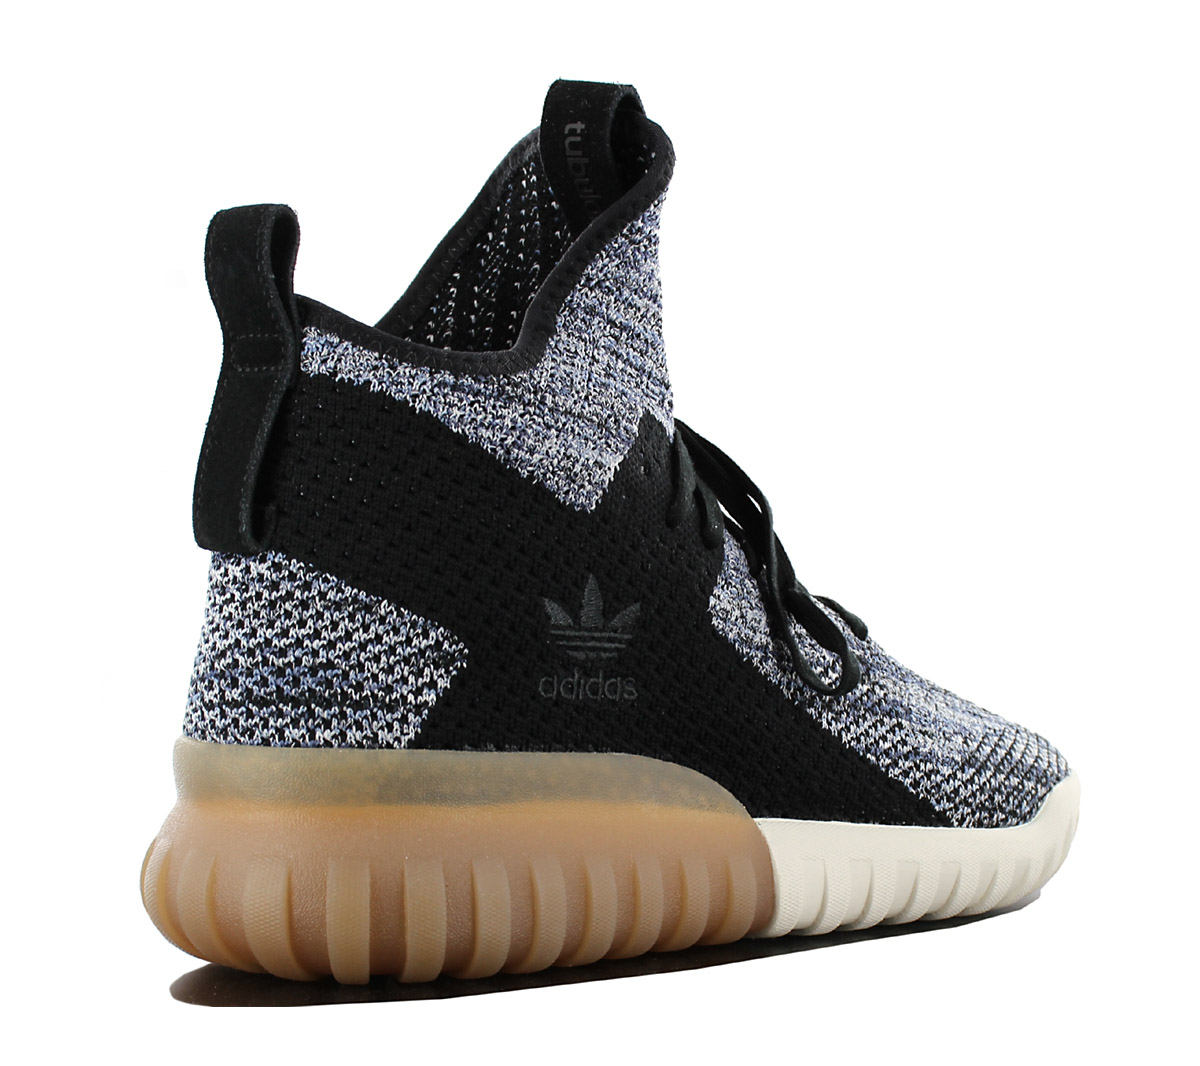 Details about Adidas Tubular x Pk Primeknit Sneaker Men's Shoes Black Grey BY3145 New